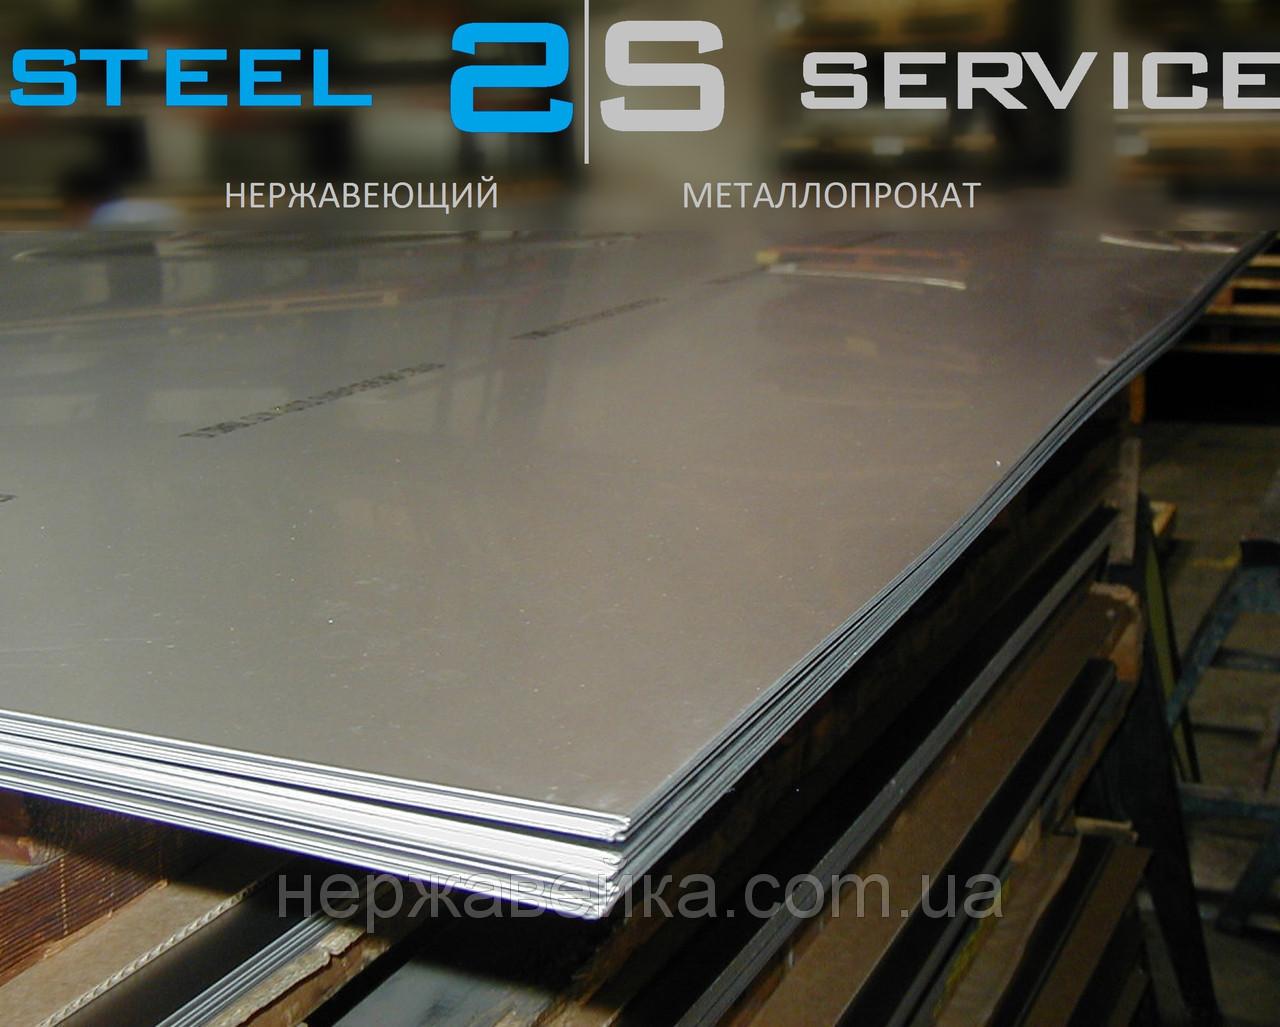 Листовая нержавейка 1,5х1500х3000мм  AISI 321(08Х18Н10Т) BA - зеркало,  пищевой